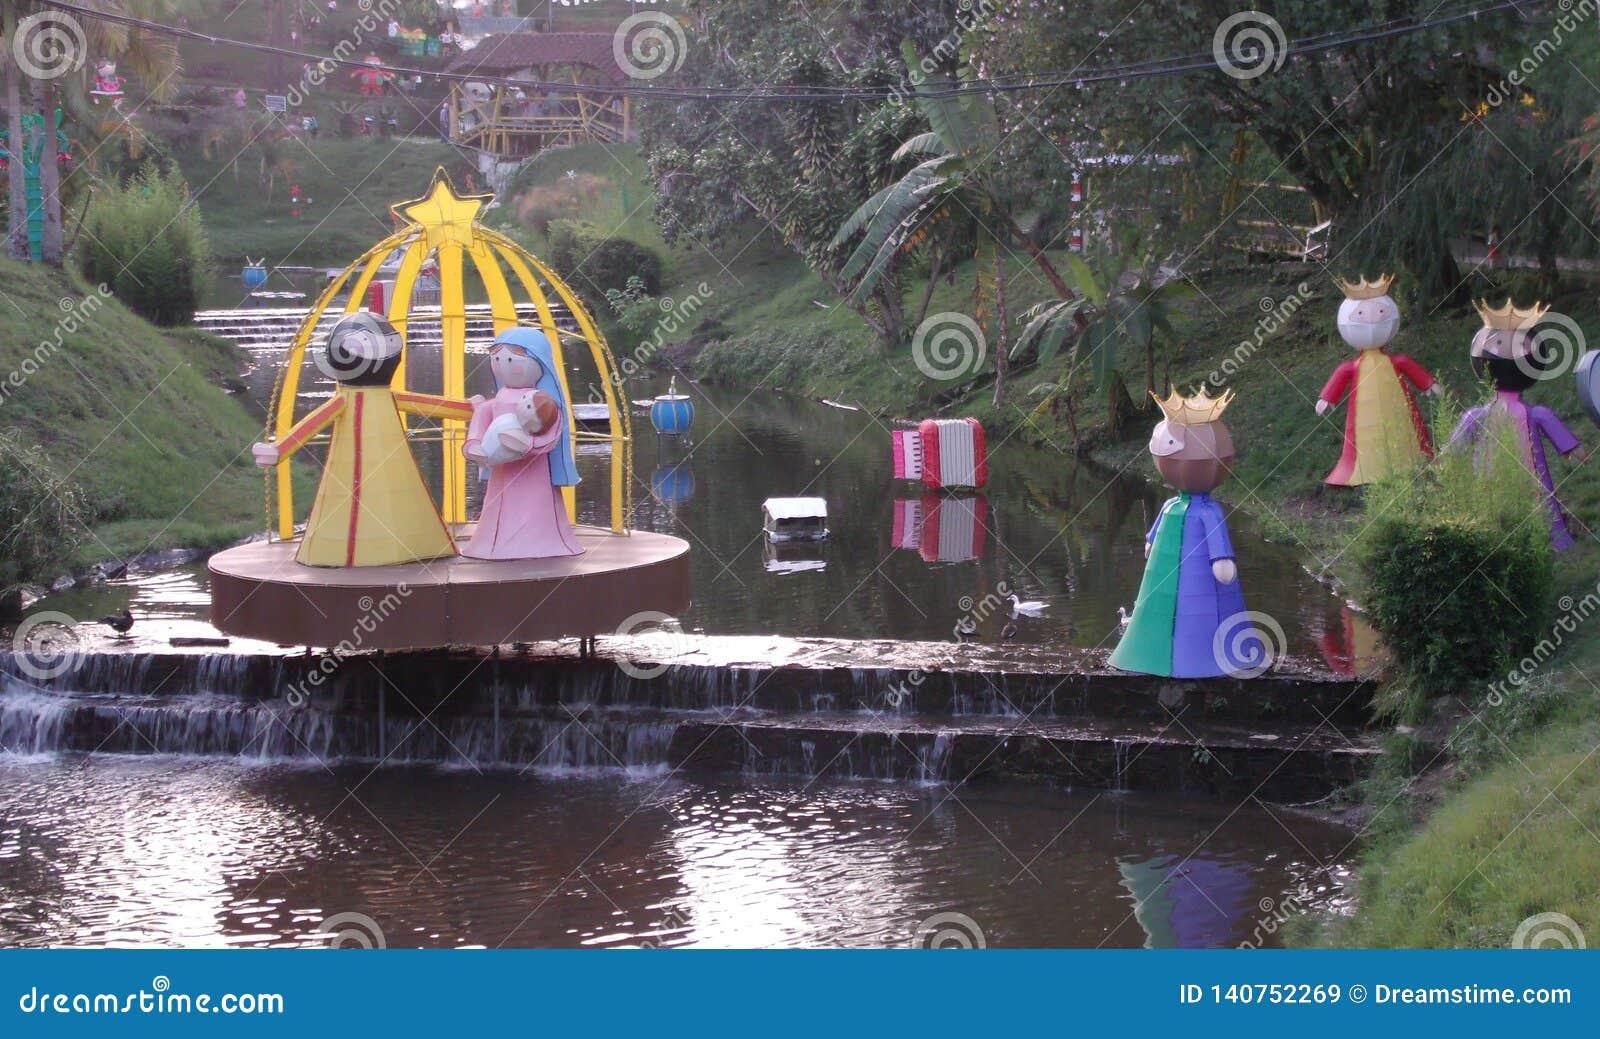 Nativity scene is decorating the stream